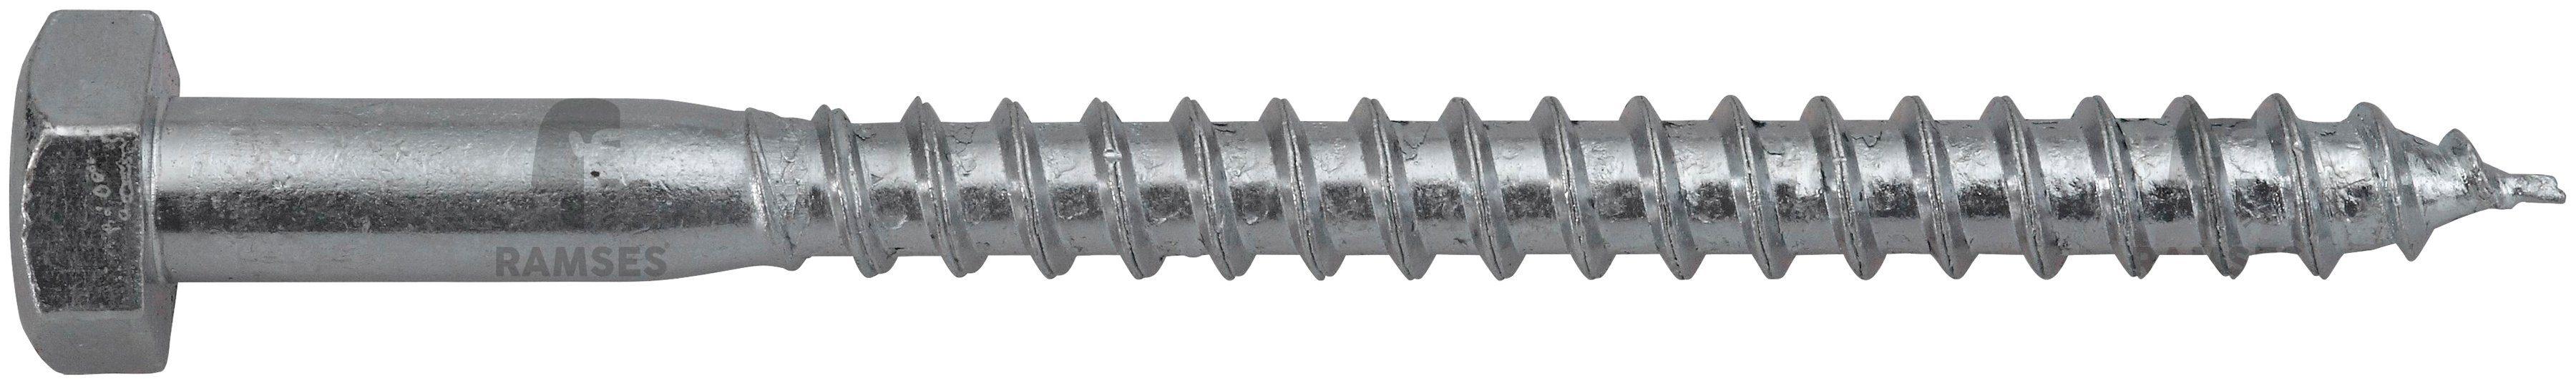 RAMSES Schrauben , Sechskant-Holzschraube 12 x 260 mm 25 Stk.